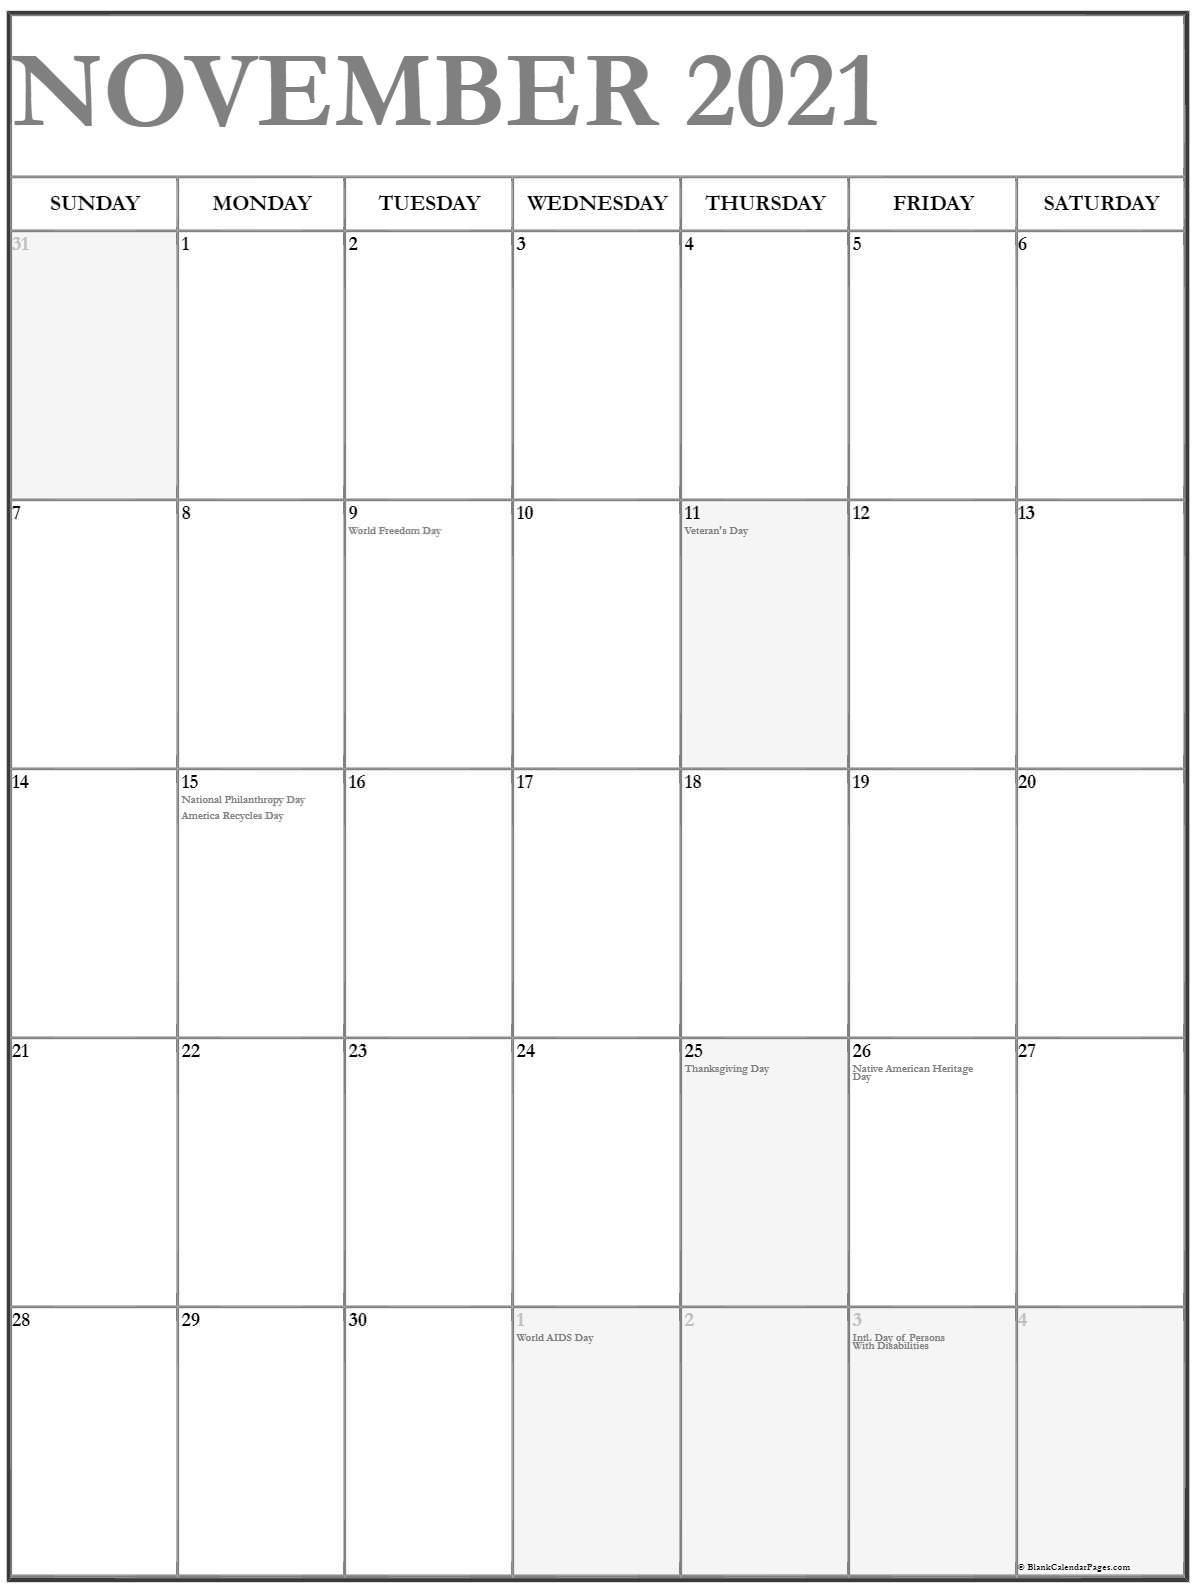 November 2021 Vertical Calendar | Portrait Calendar November 2020 Through April 2021